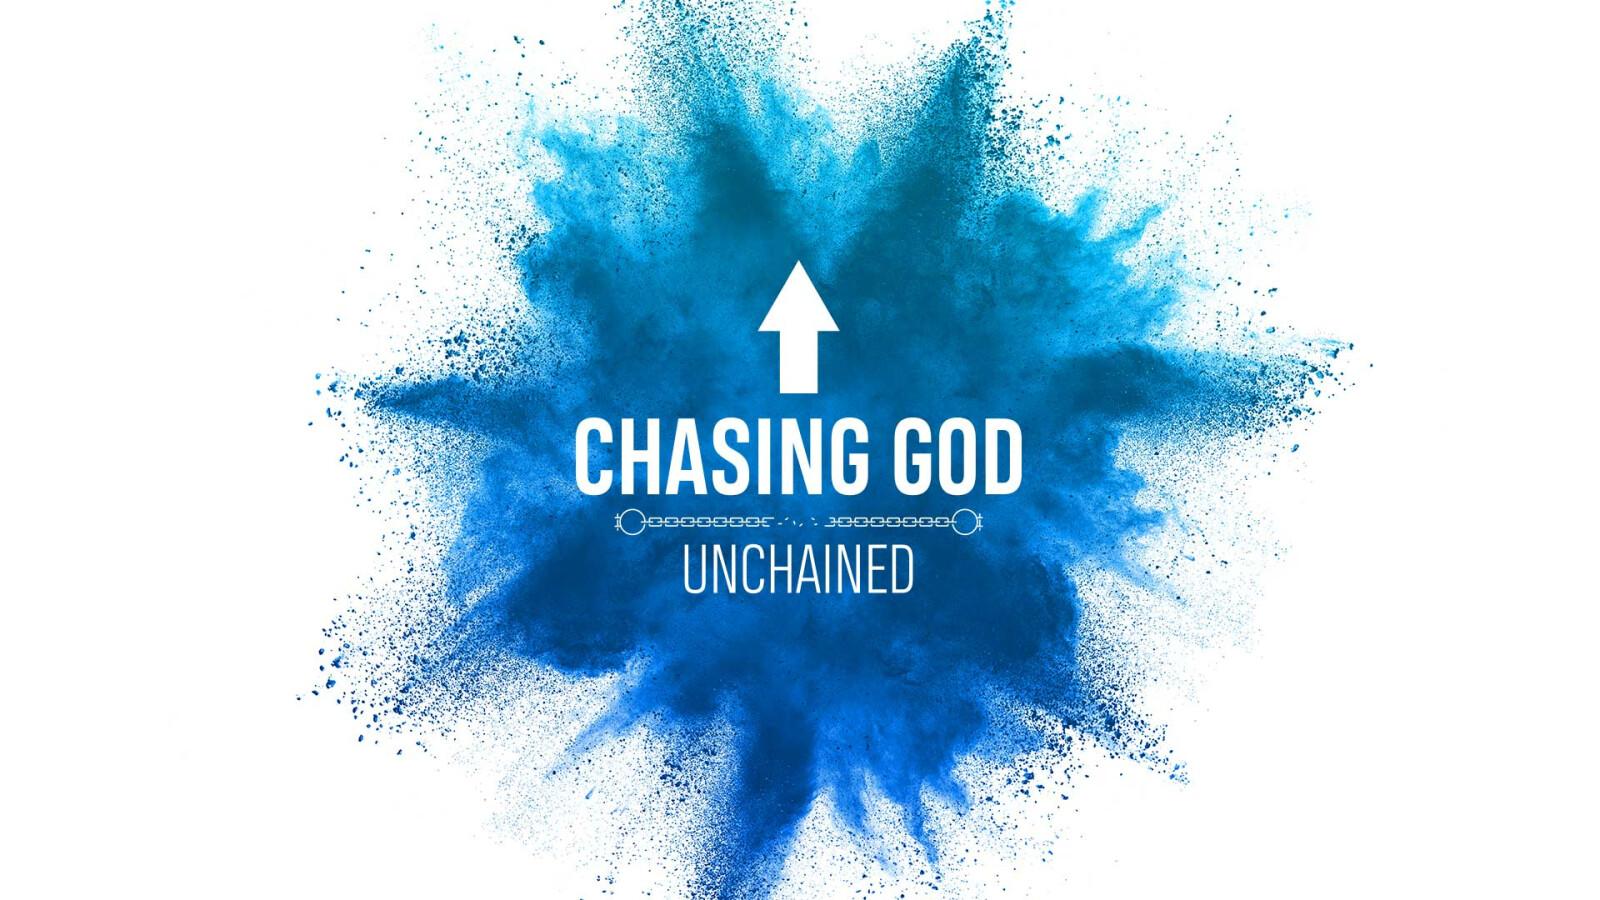 Chasing God 2019